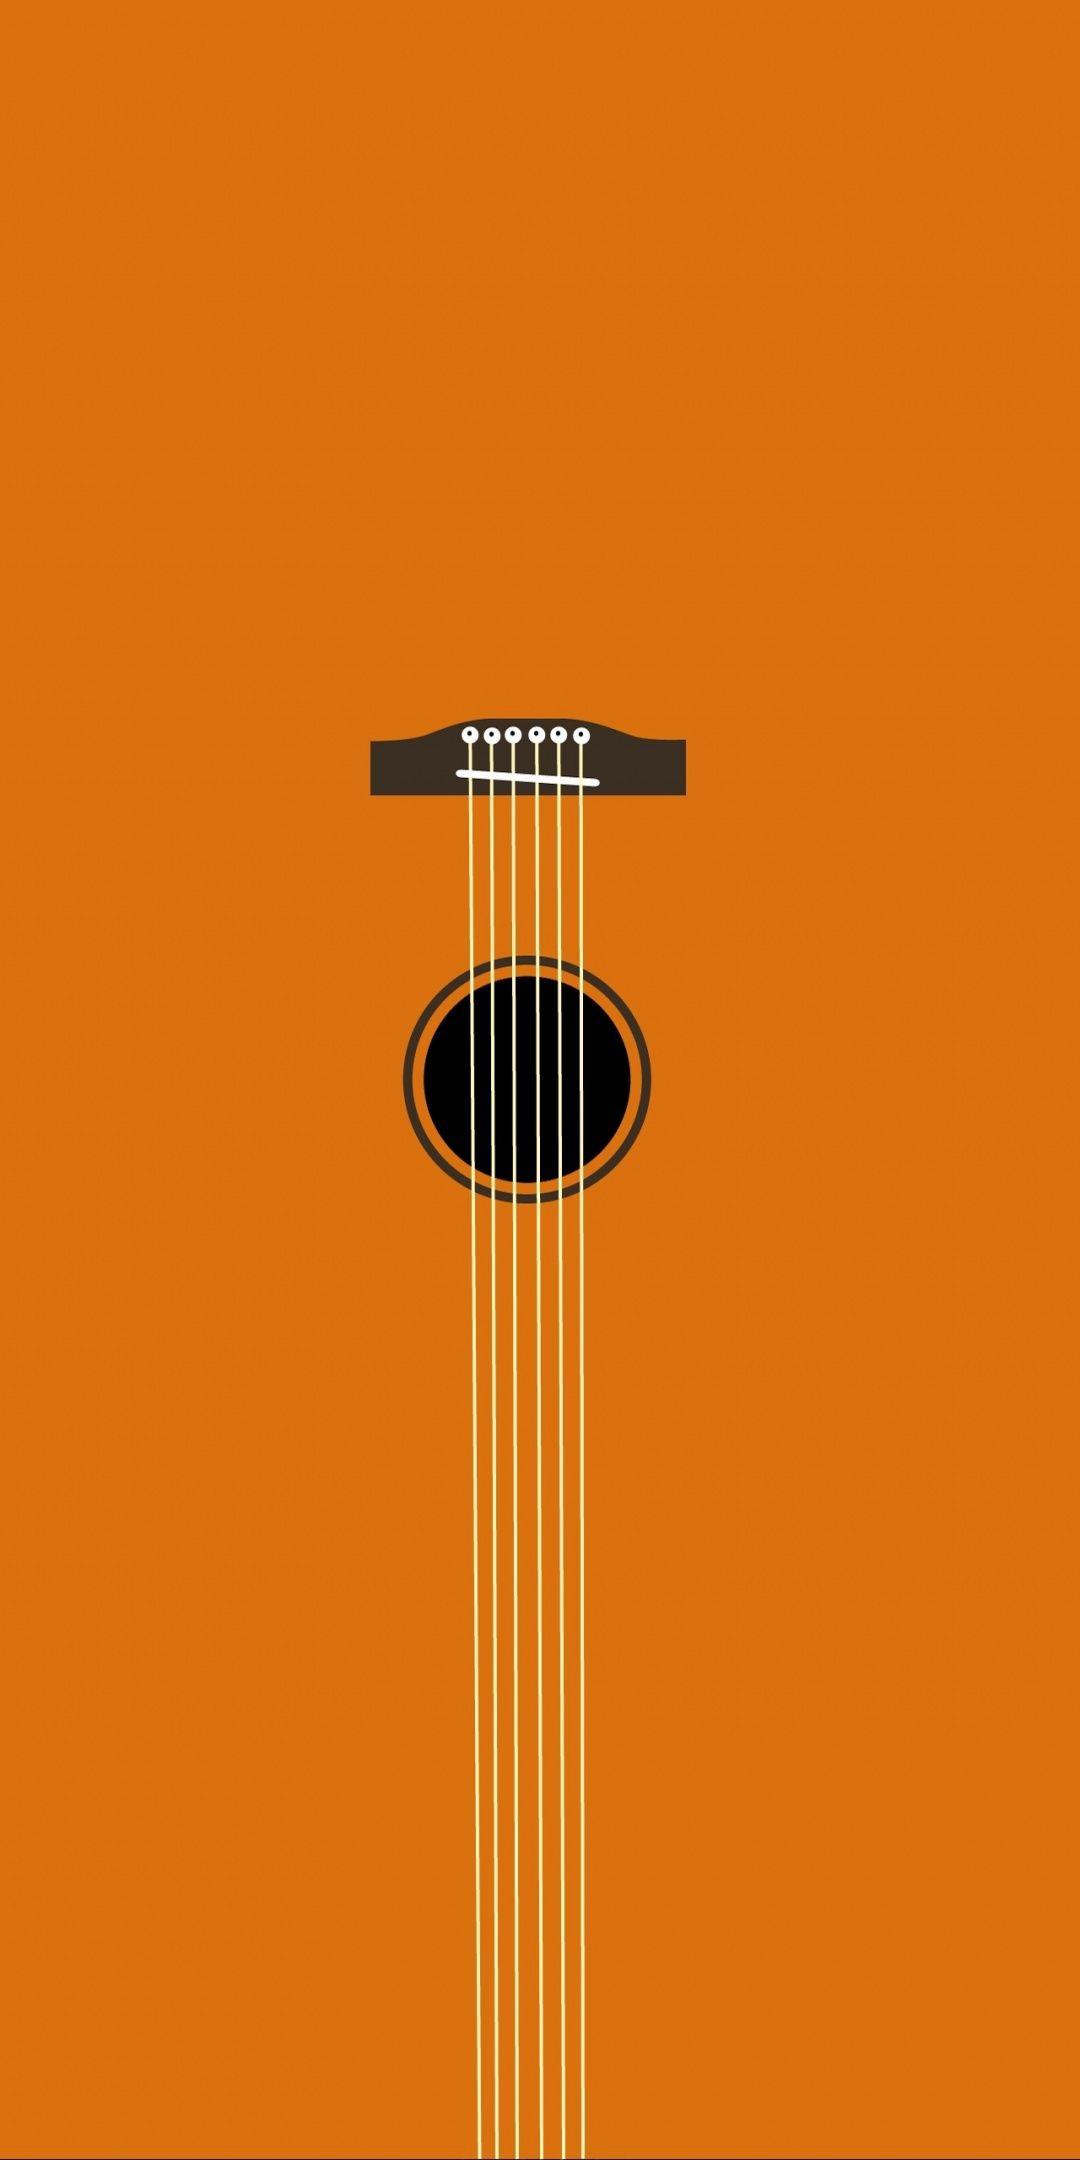 Minimal Music Guitar Art 1080x2160 Wallpaper Guitar Wallpaper Iphone Minimalist Wallpaper Acoustic Guitar Photography